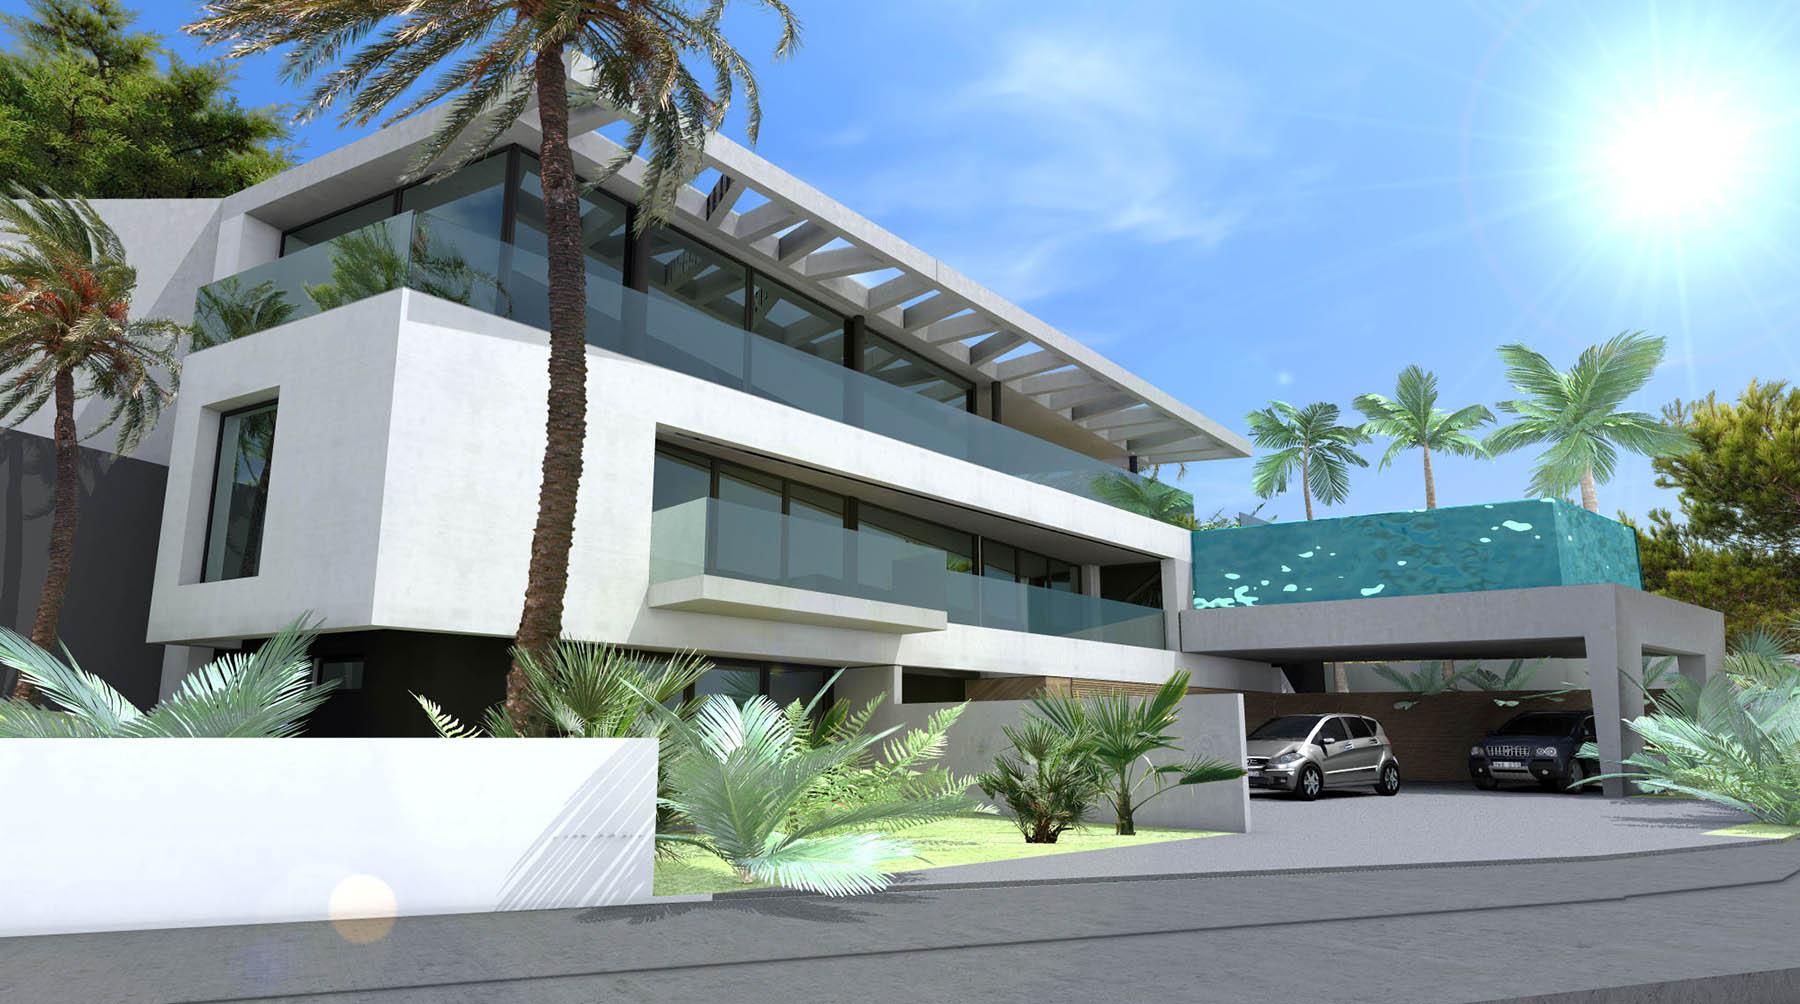 Villa-architecte-2.jpg